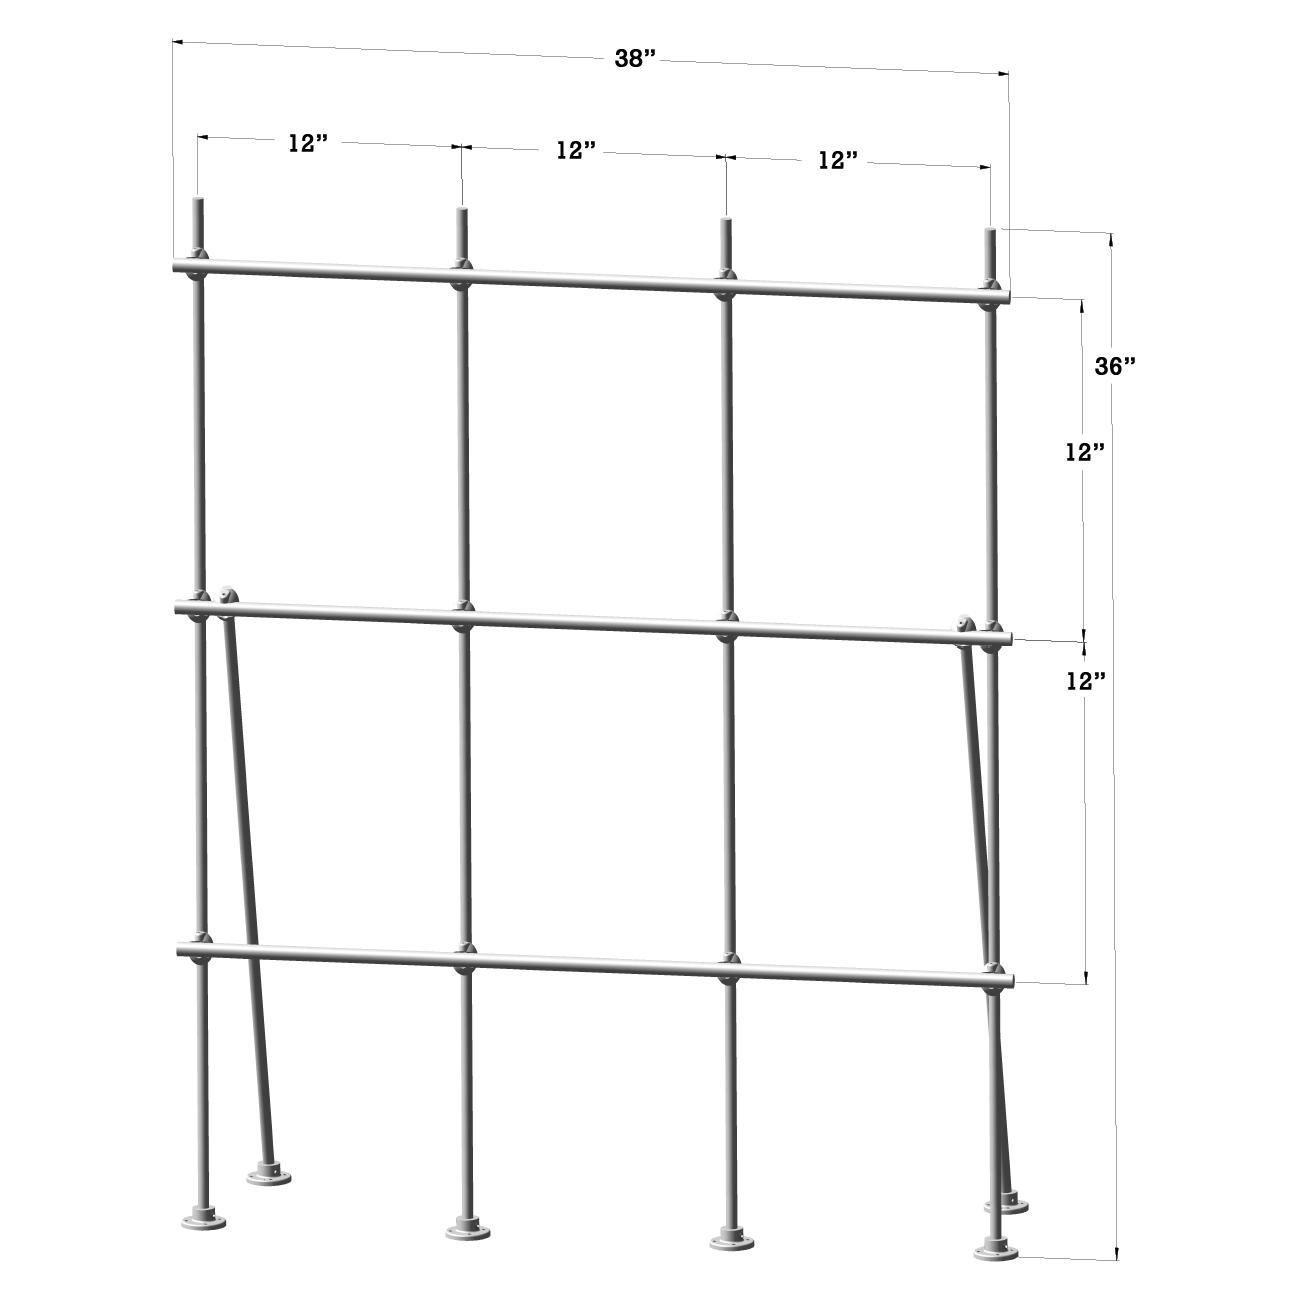 Lee Engineering Table Top Mount Lab-Frame Kit